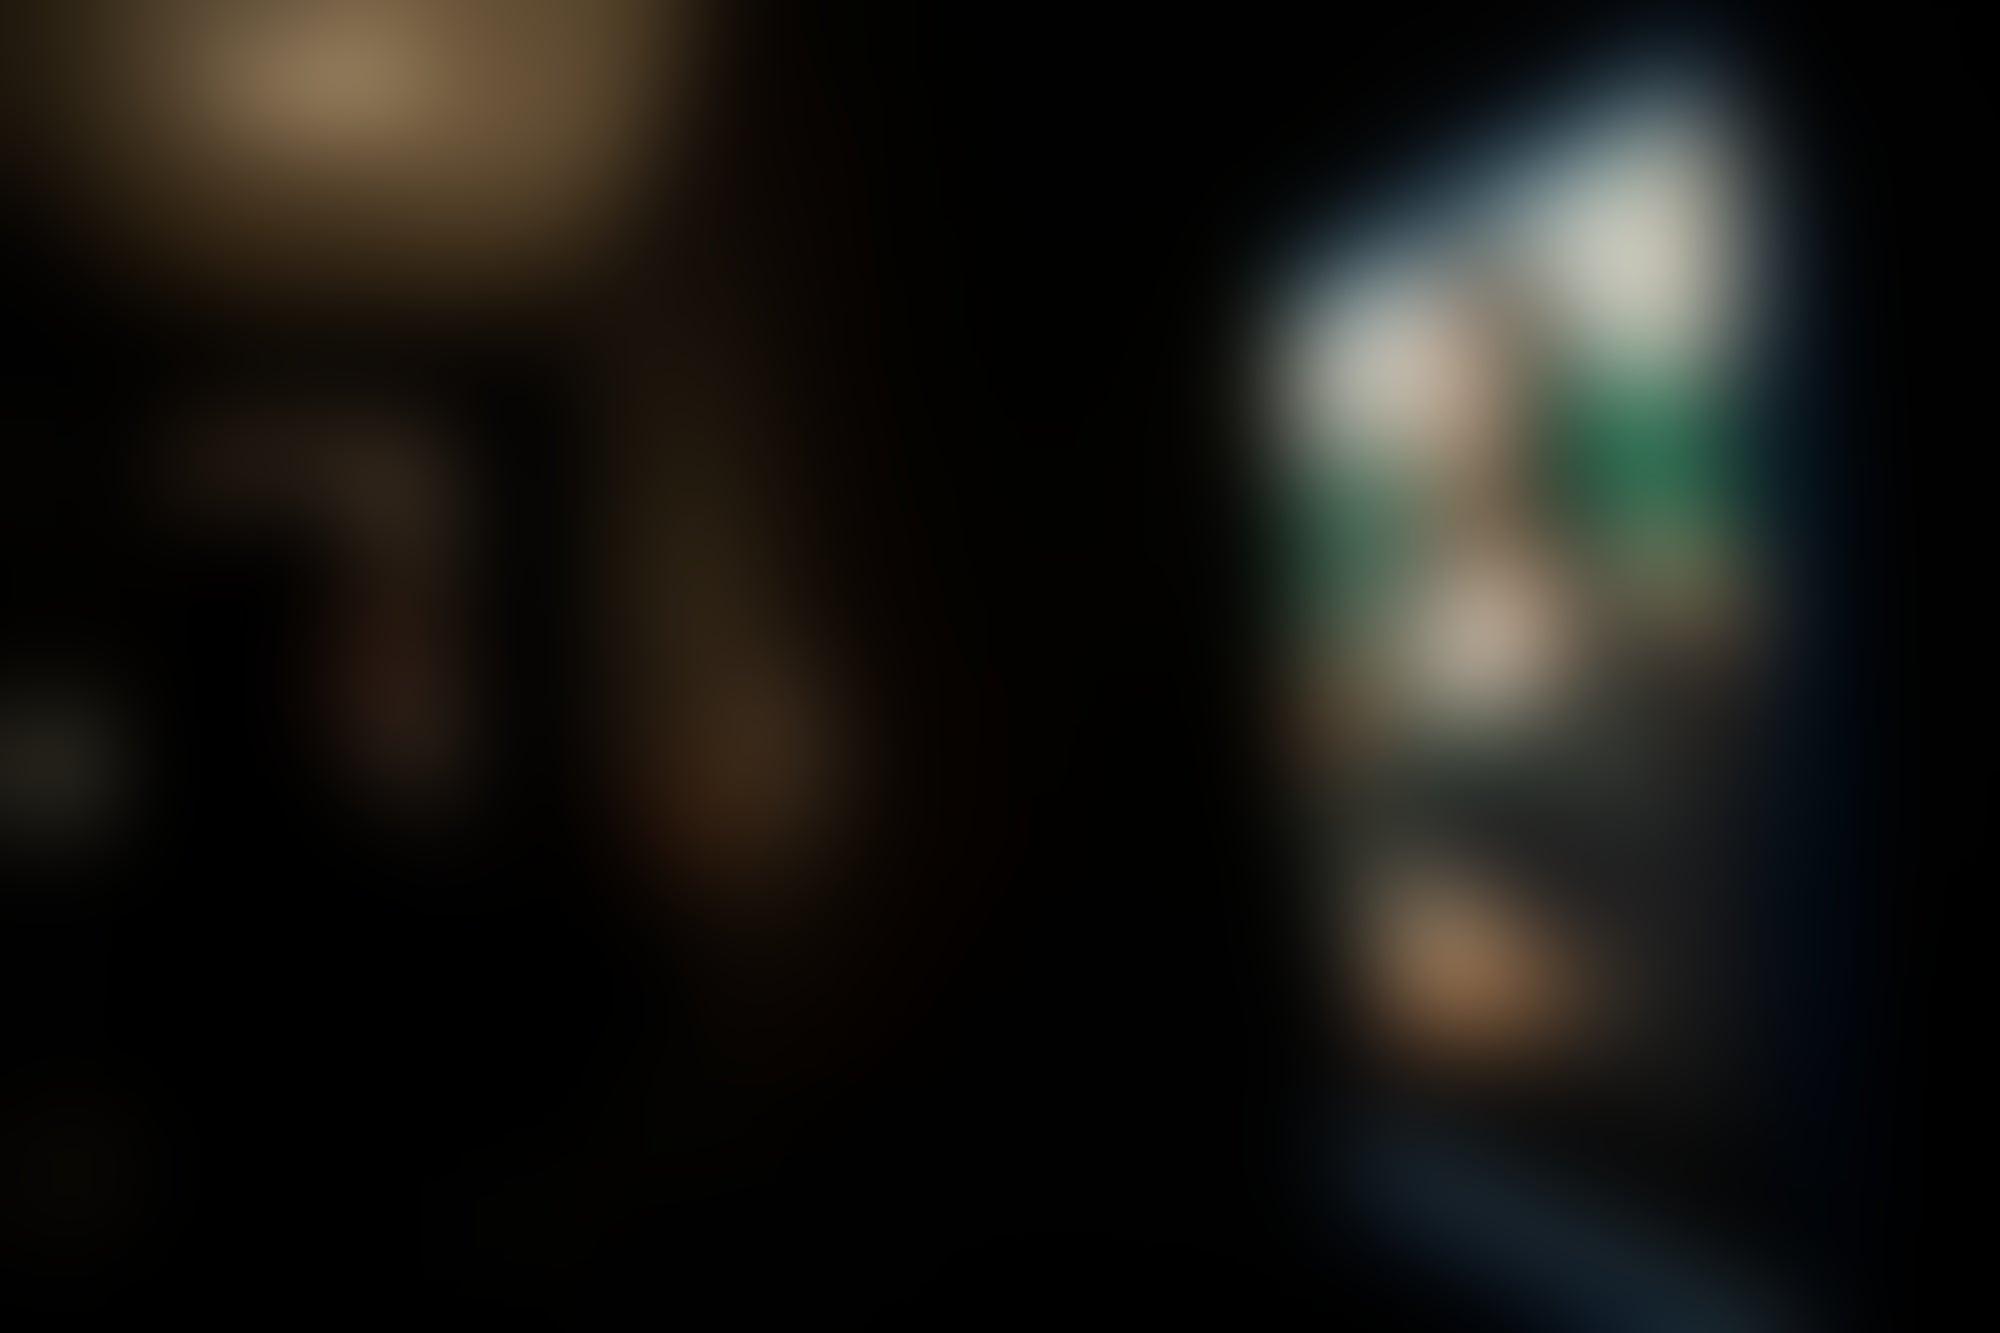 Mona Lisa Overdrive: Art Collides With Digital Technology